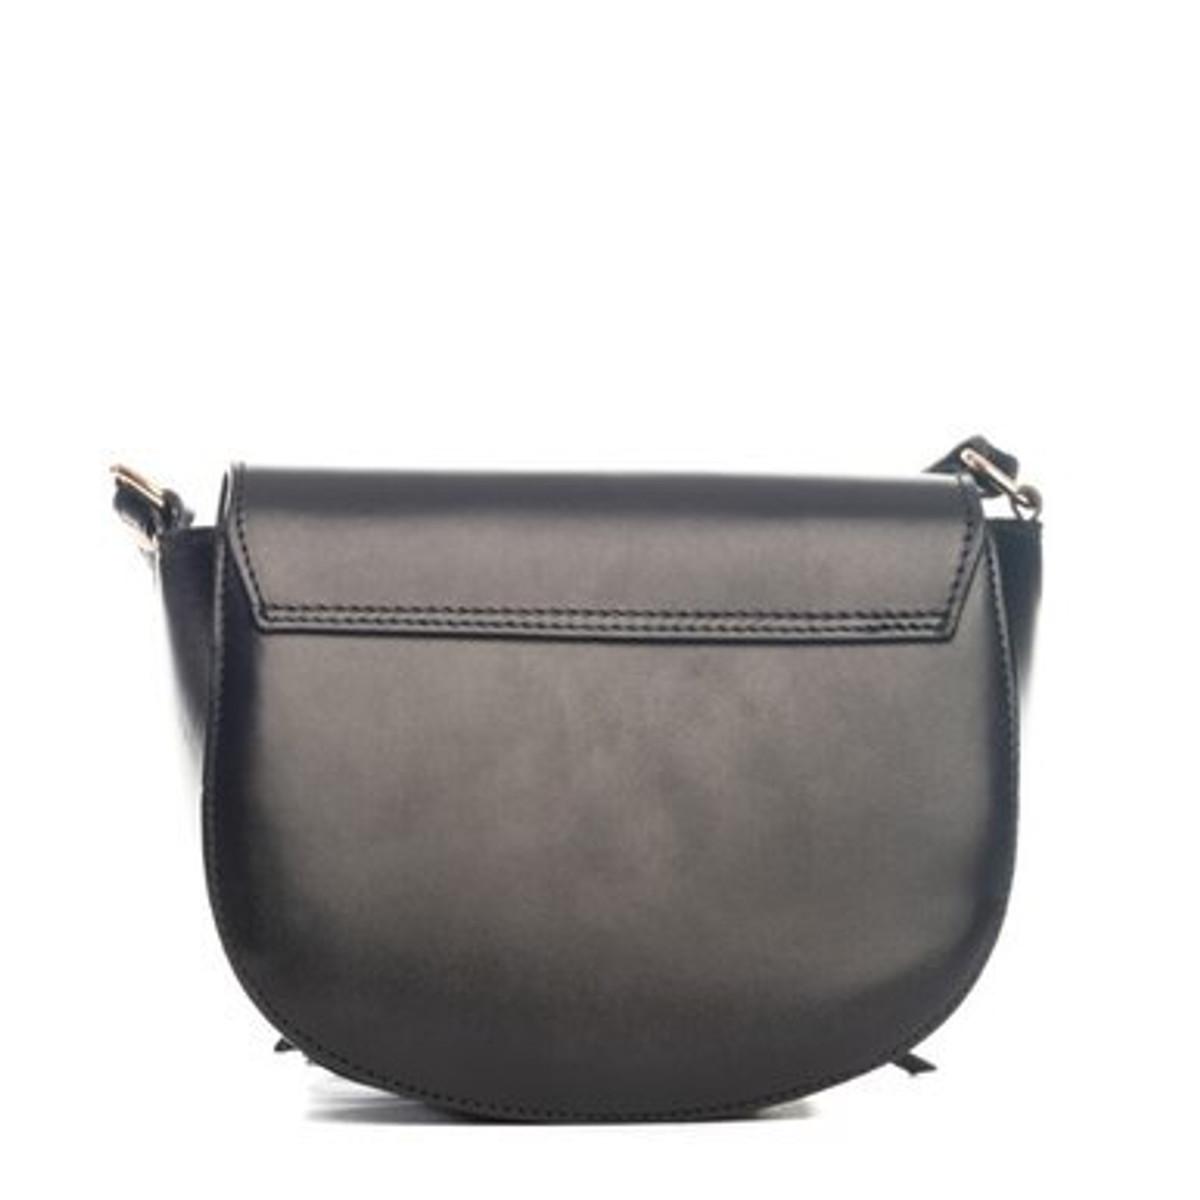 Lia Biassoni Tidone shoulderbag